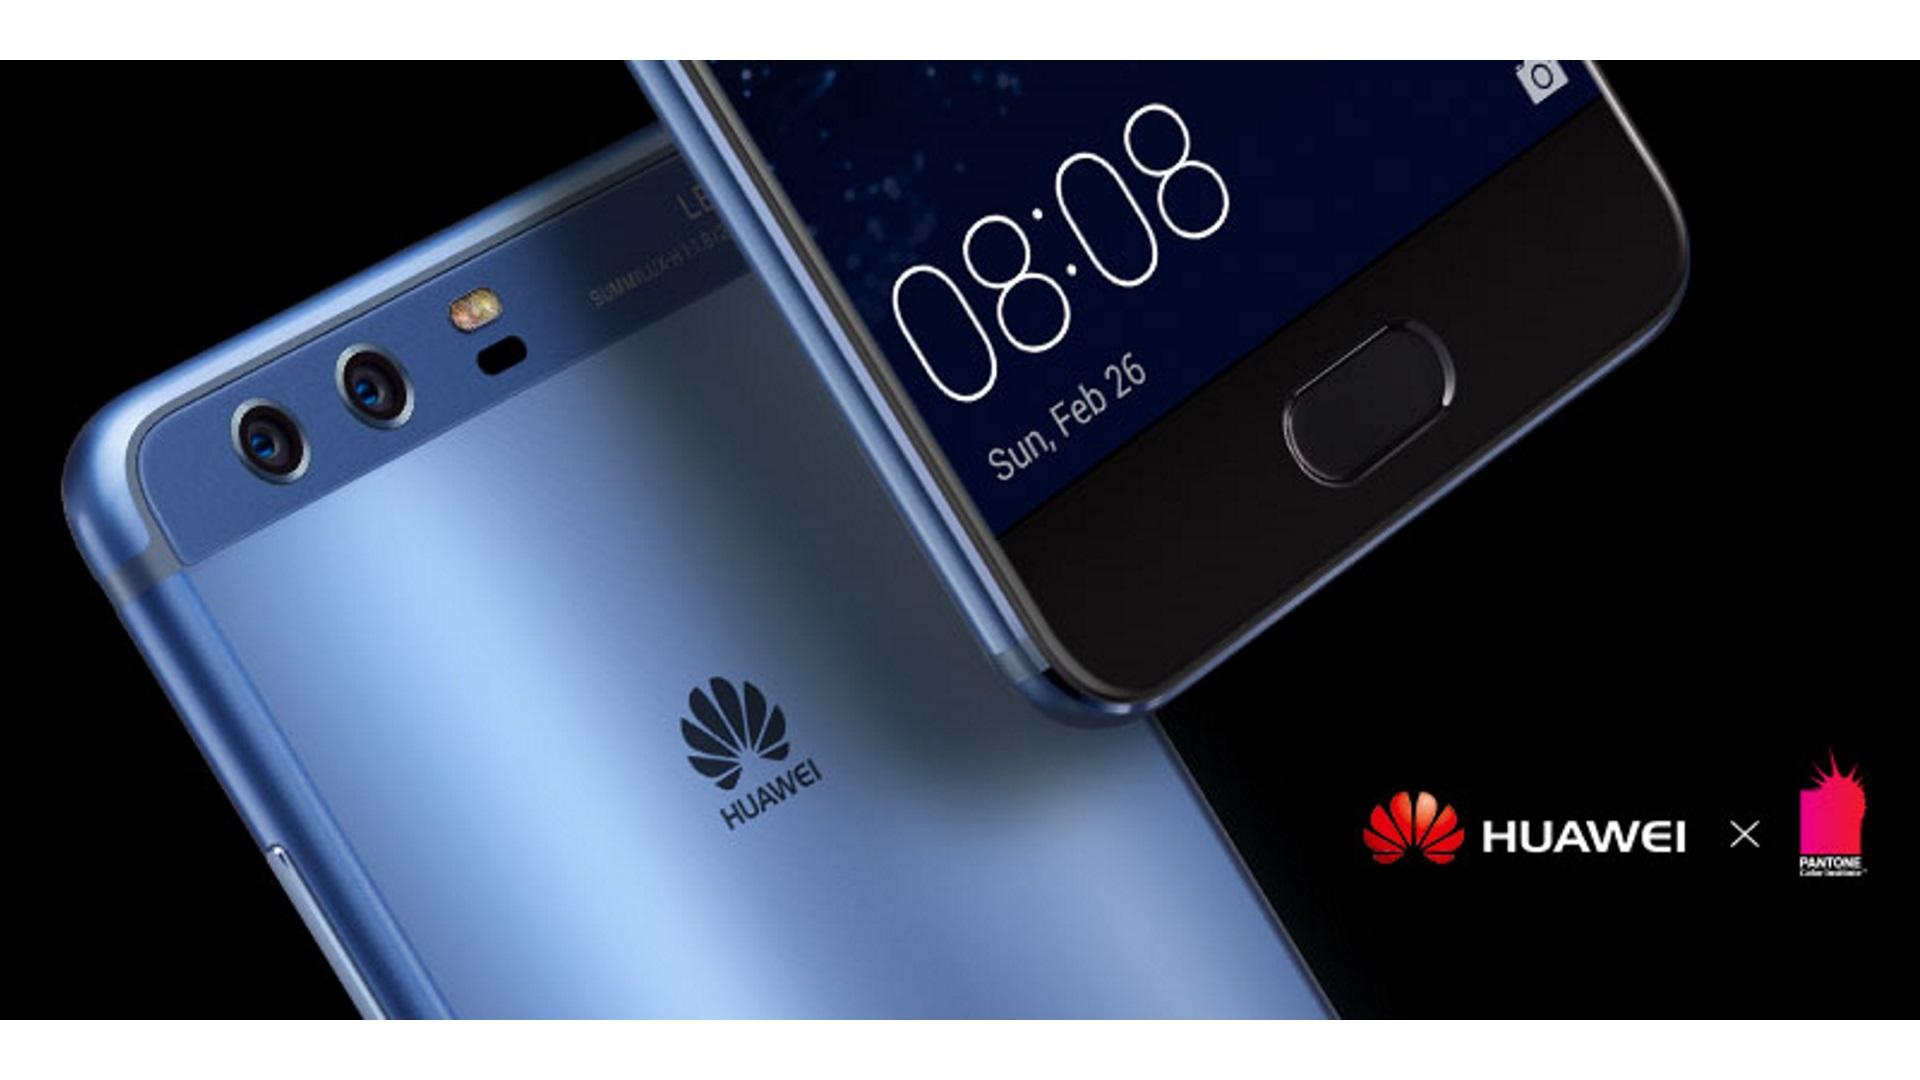 「Huawei P10/P10 Plus/P10 lite」「Huawei Watch 2」国内投入発表、6月9日発売